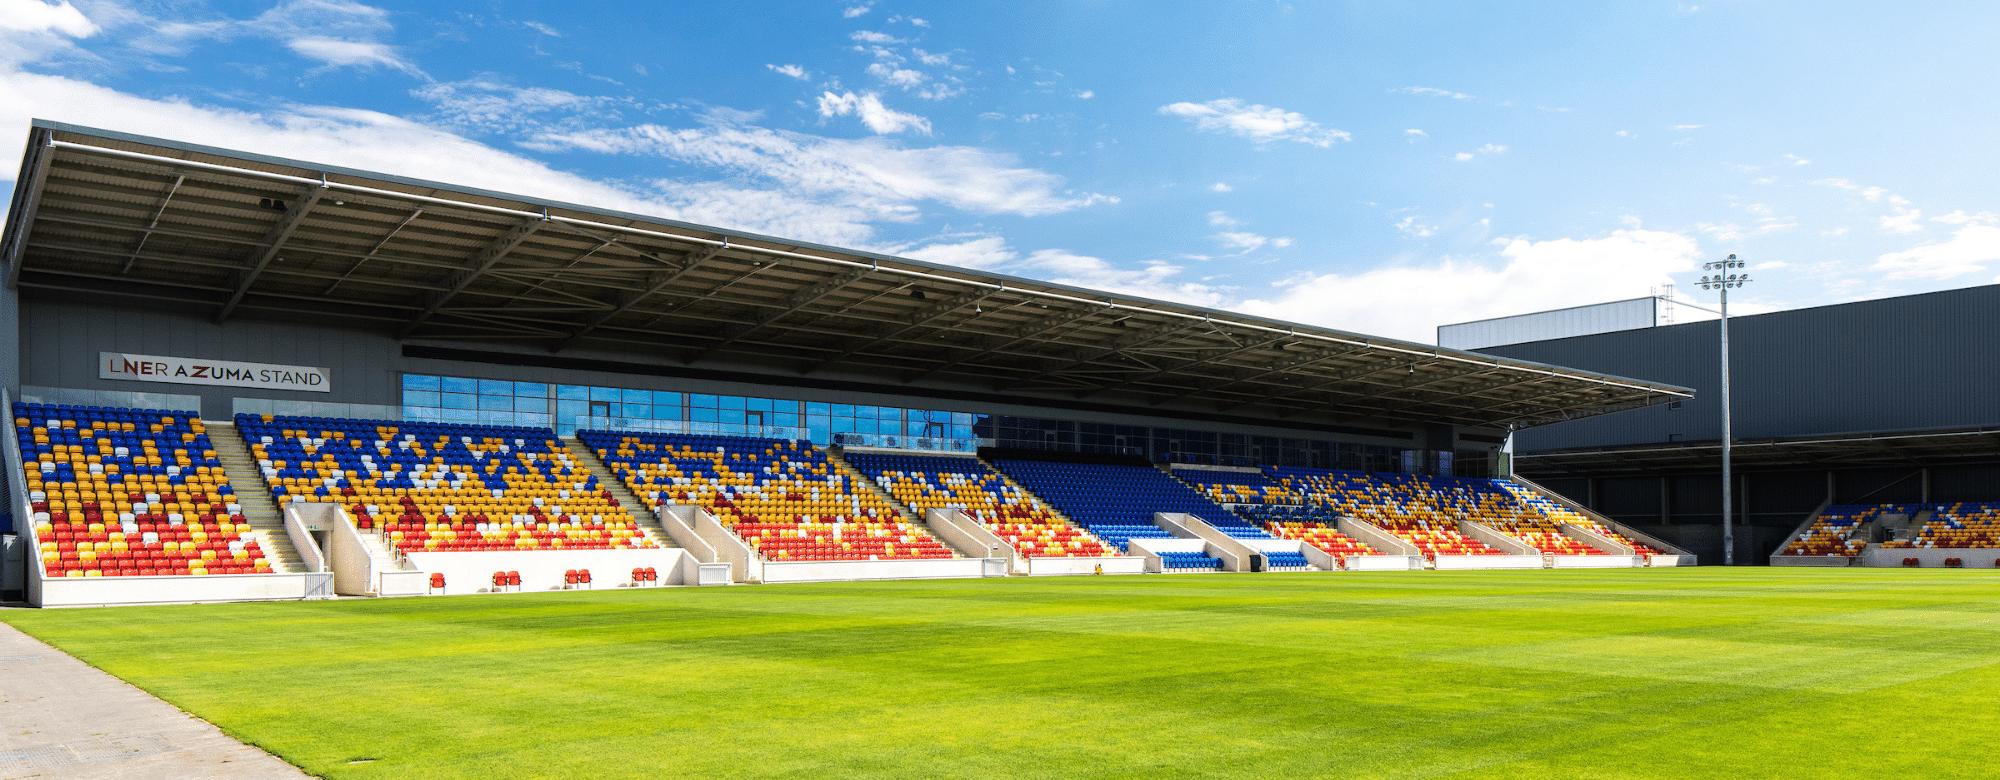 Hull To Face York In Pre-Season Friendly In LNER Stadium Opener